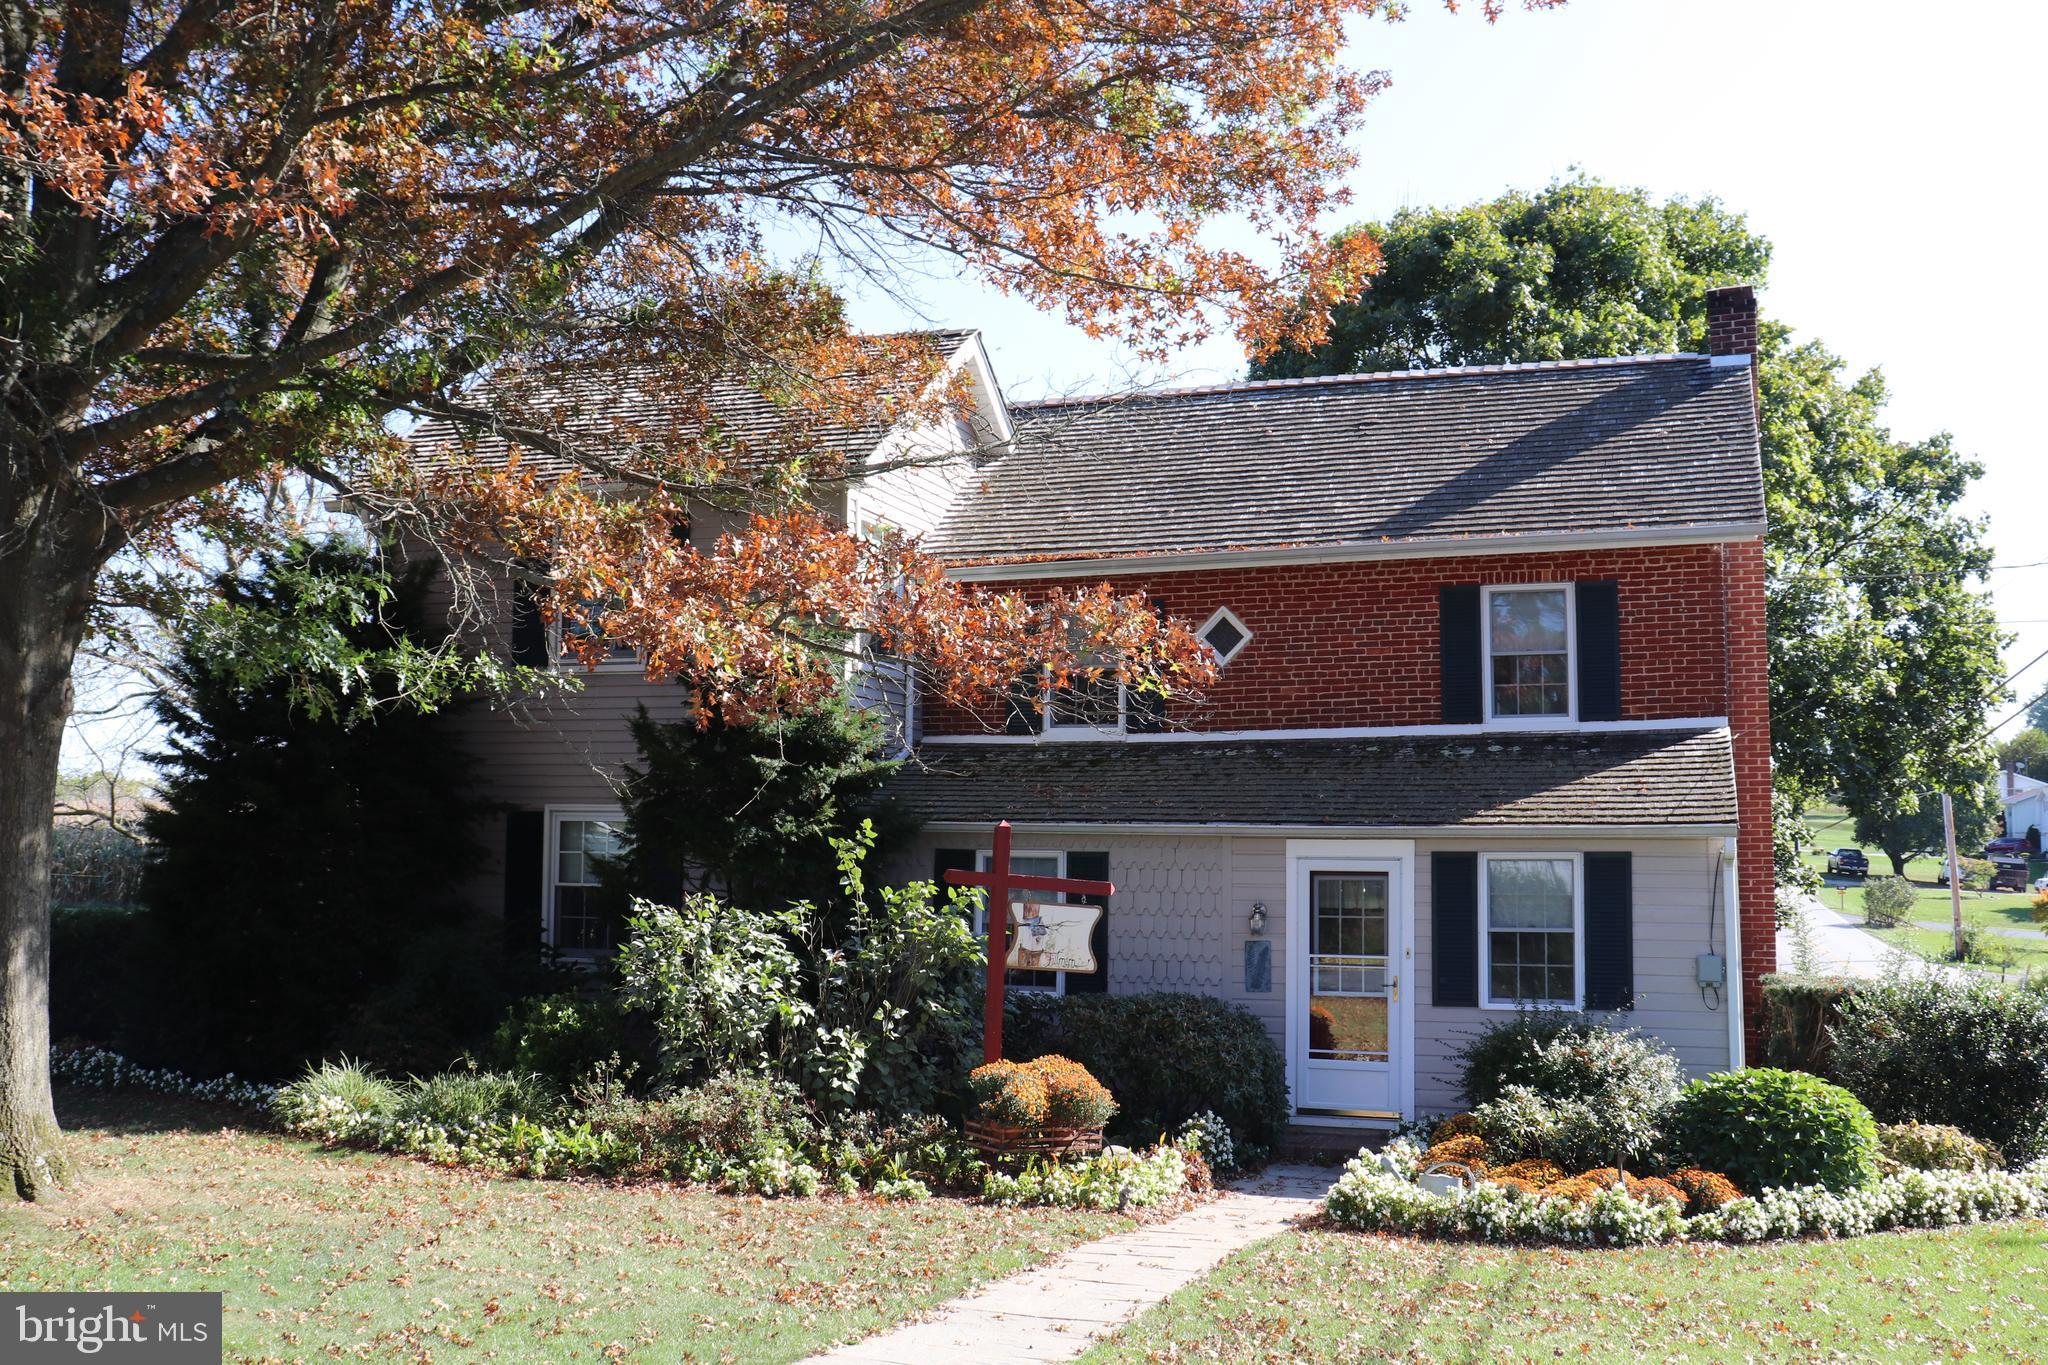 4776 BLUE HILL RD, GLENVILLE, PA 17329